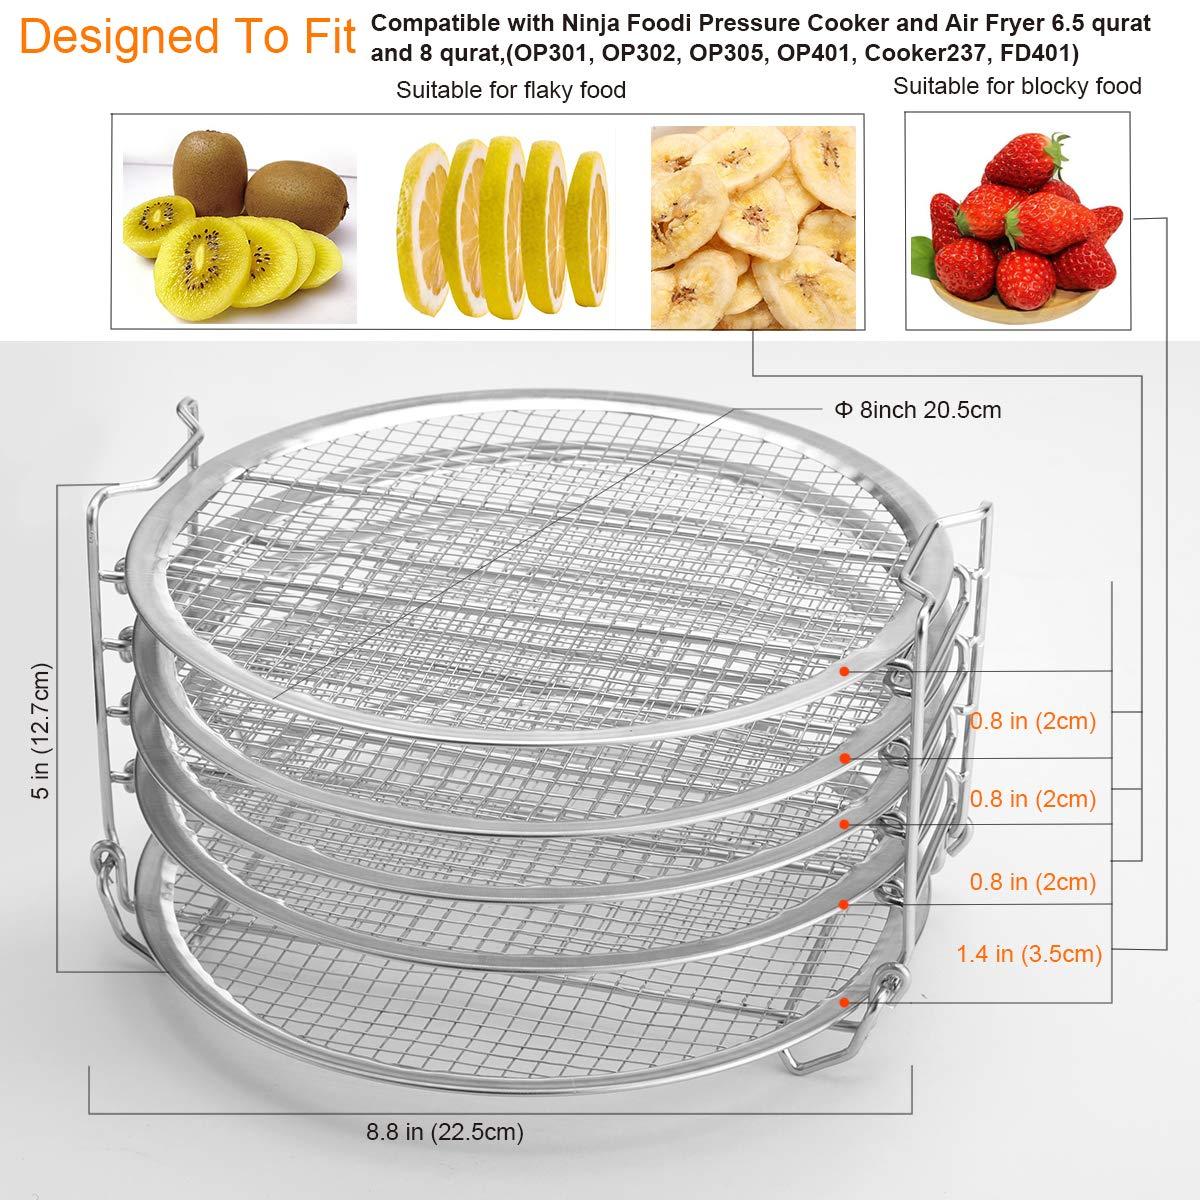 Amazon.com: Soporte deshidratador para Ninja Foodi, 6.5 qt y ...